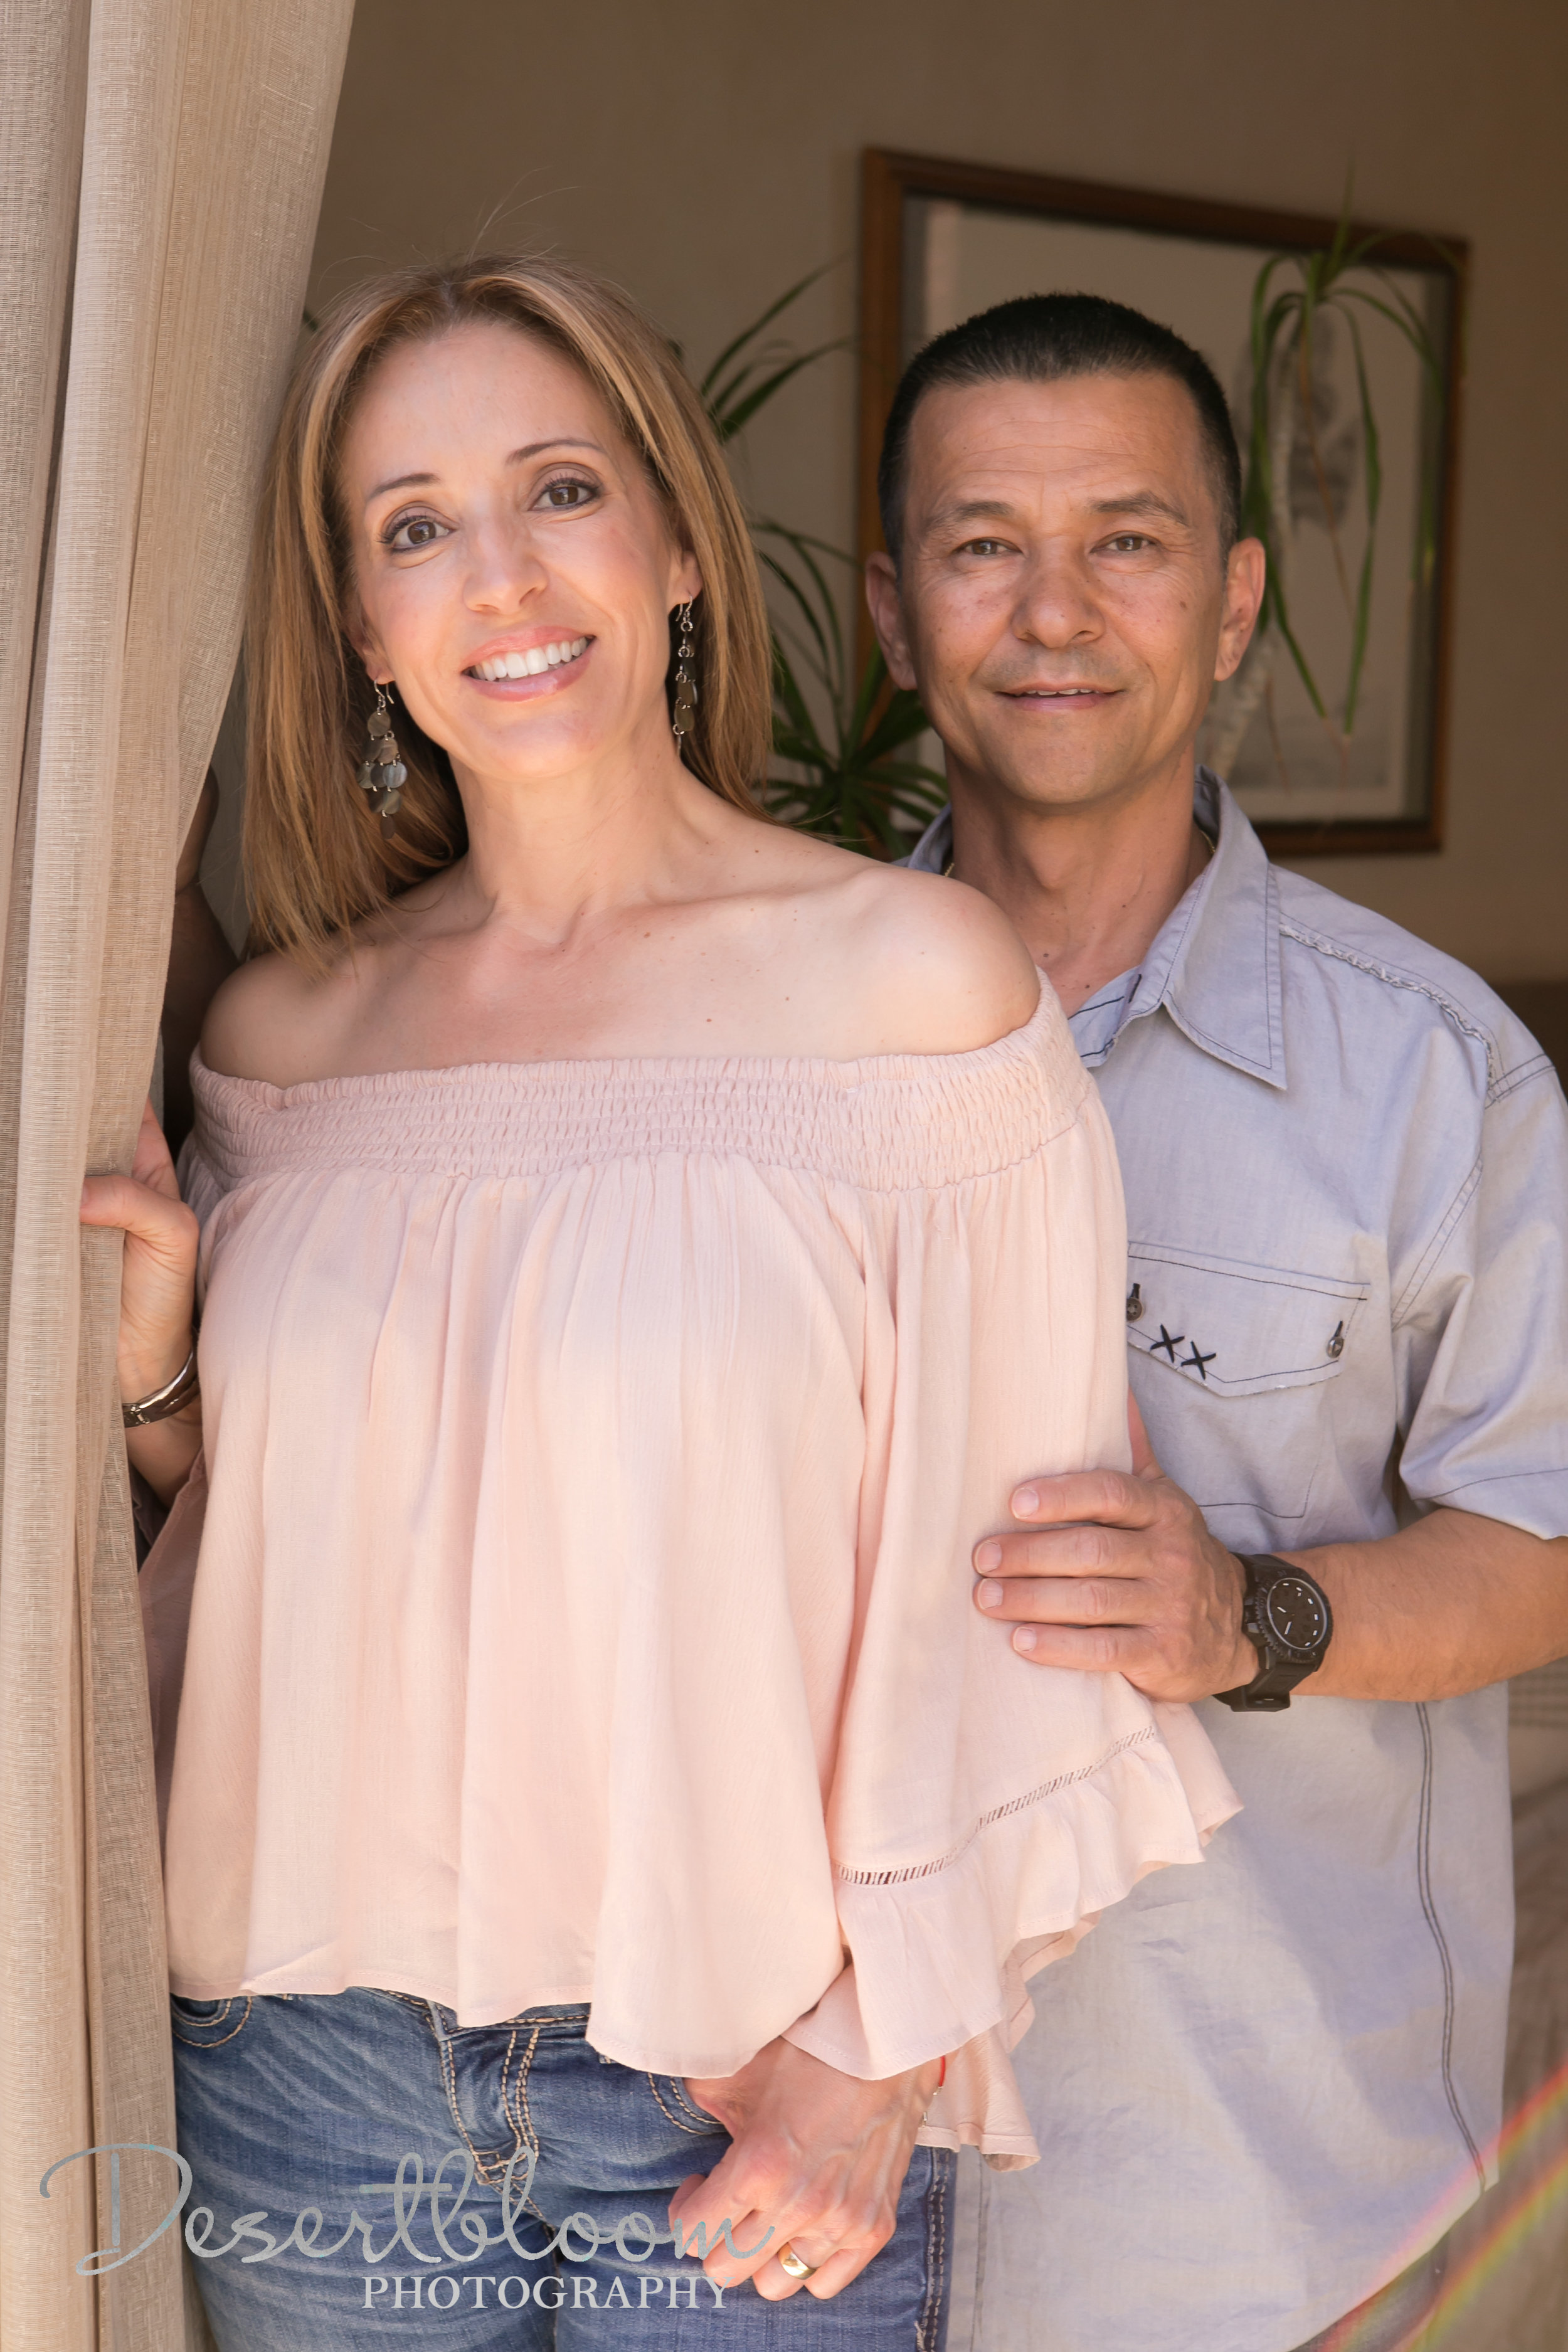 couples-photographer-session-las-vegas-springs-preserve-photography.jpg